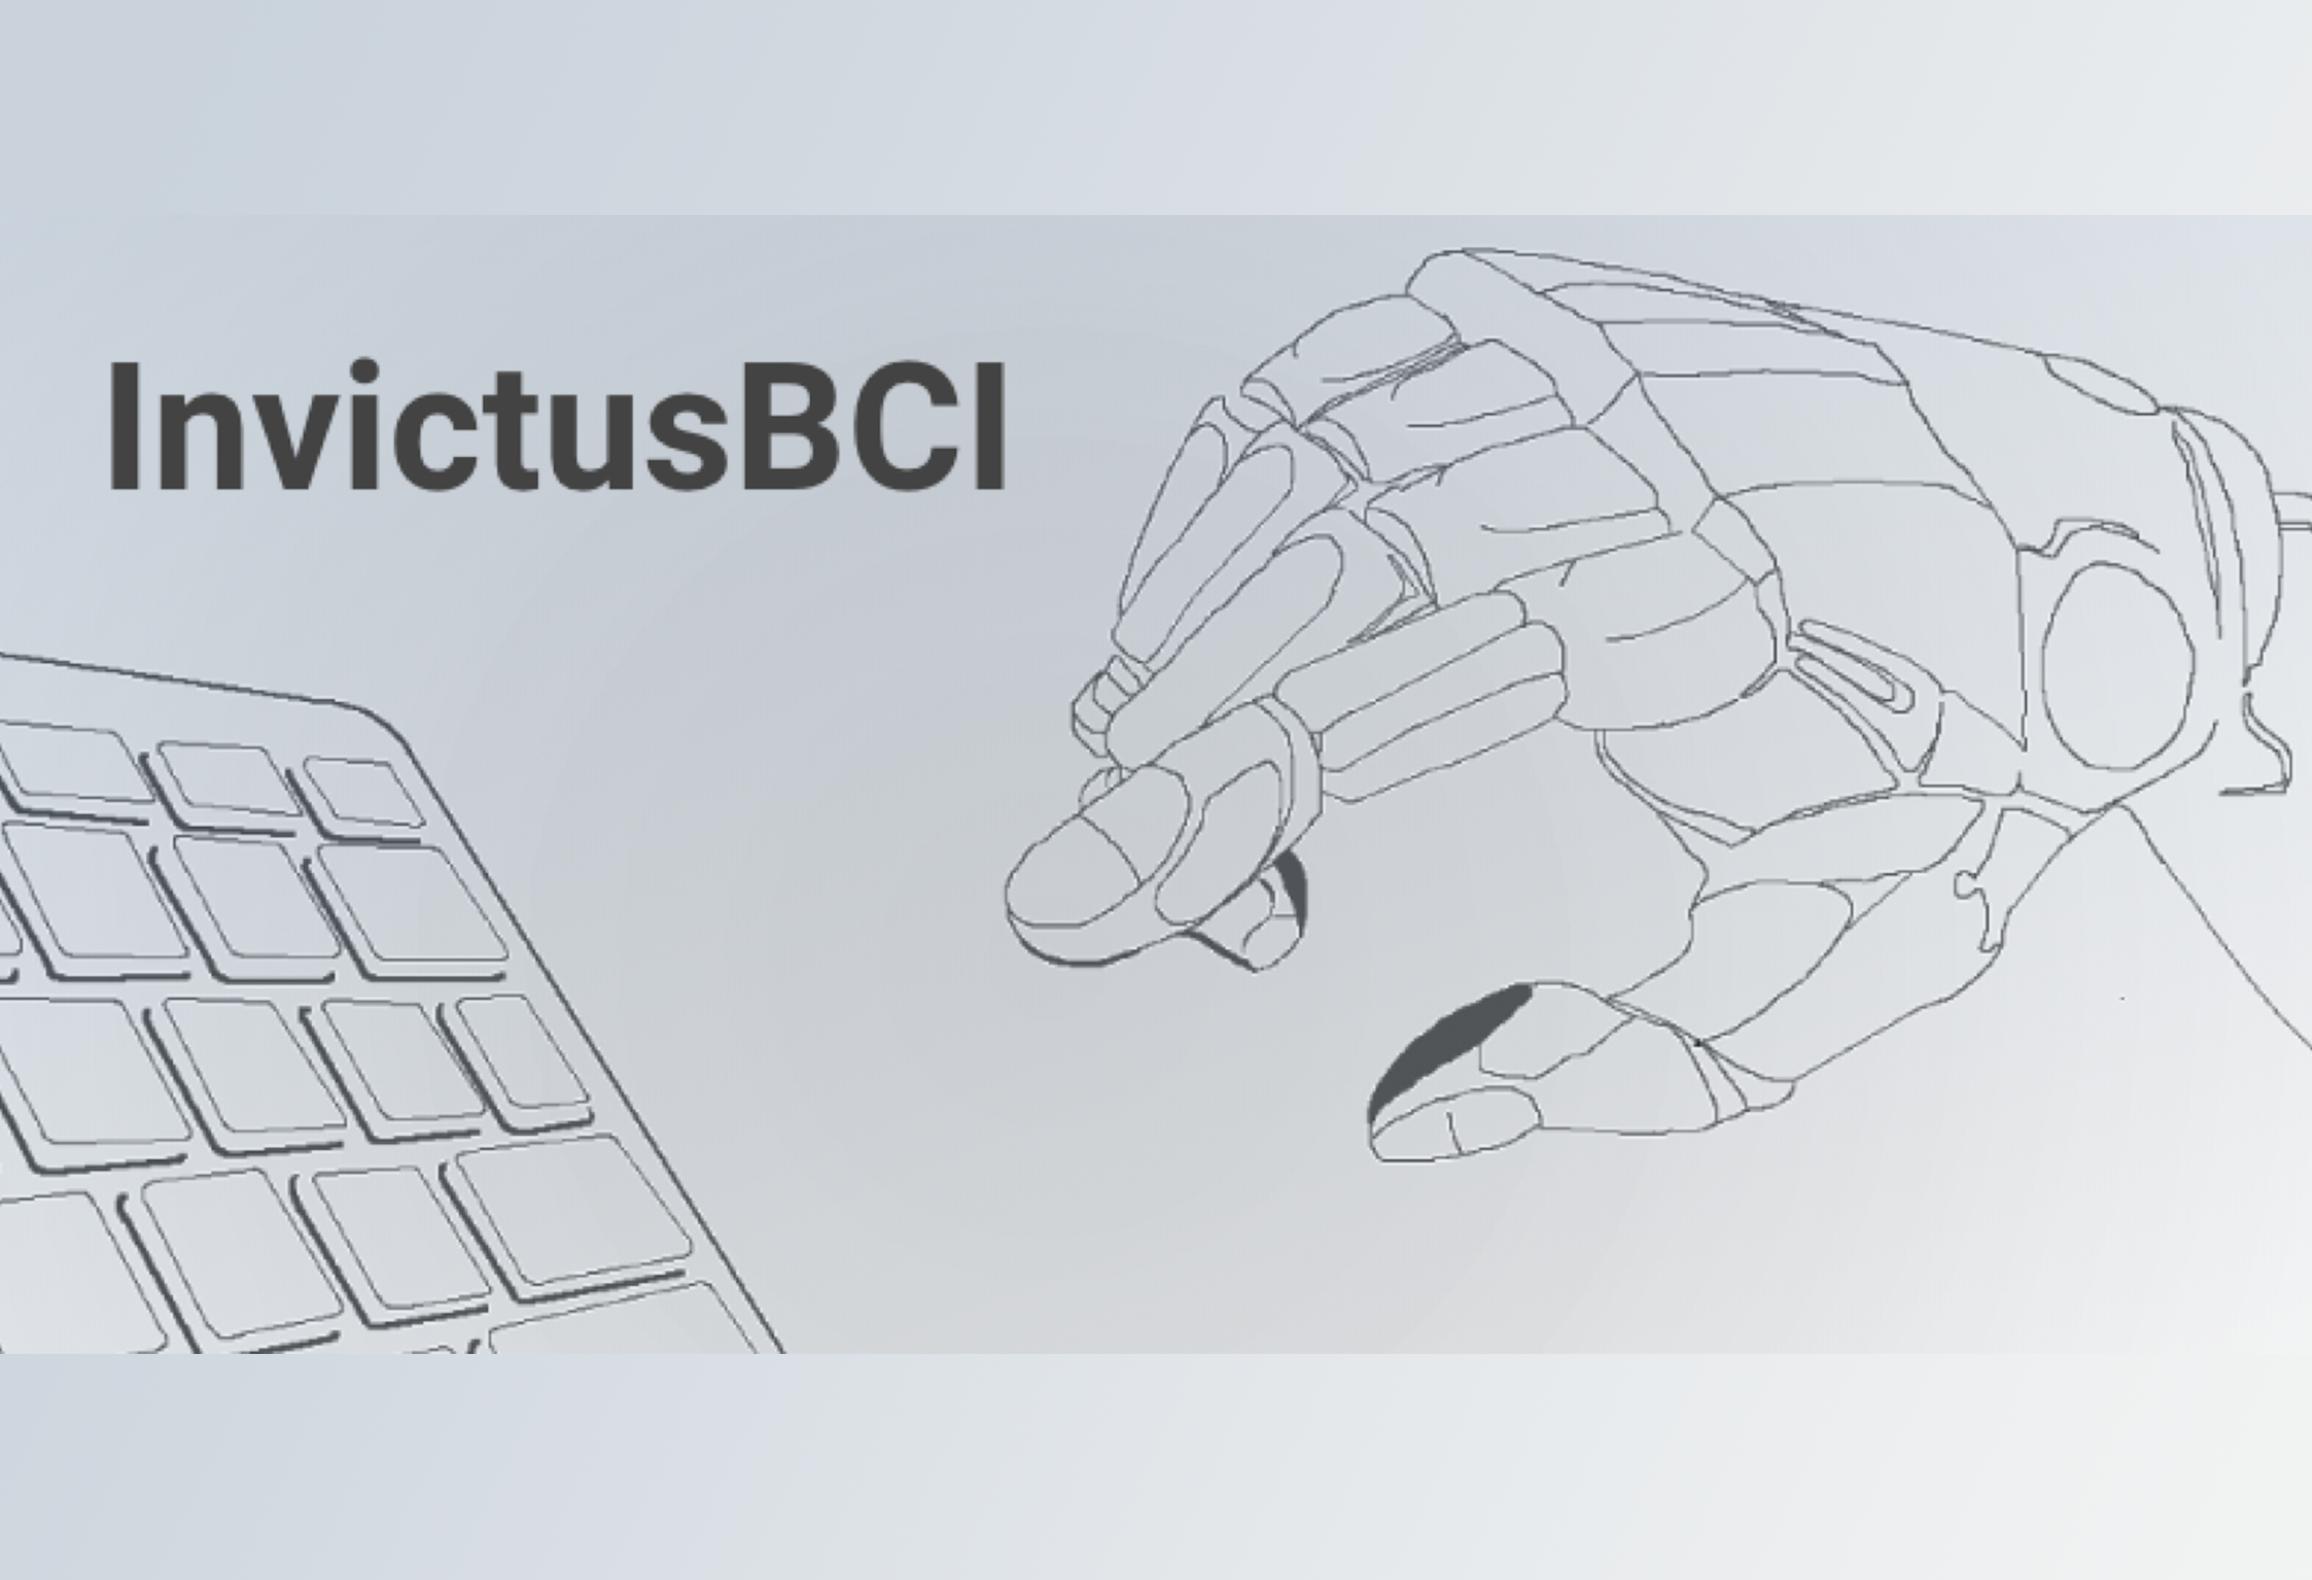 InvictusBCI logo